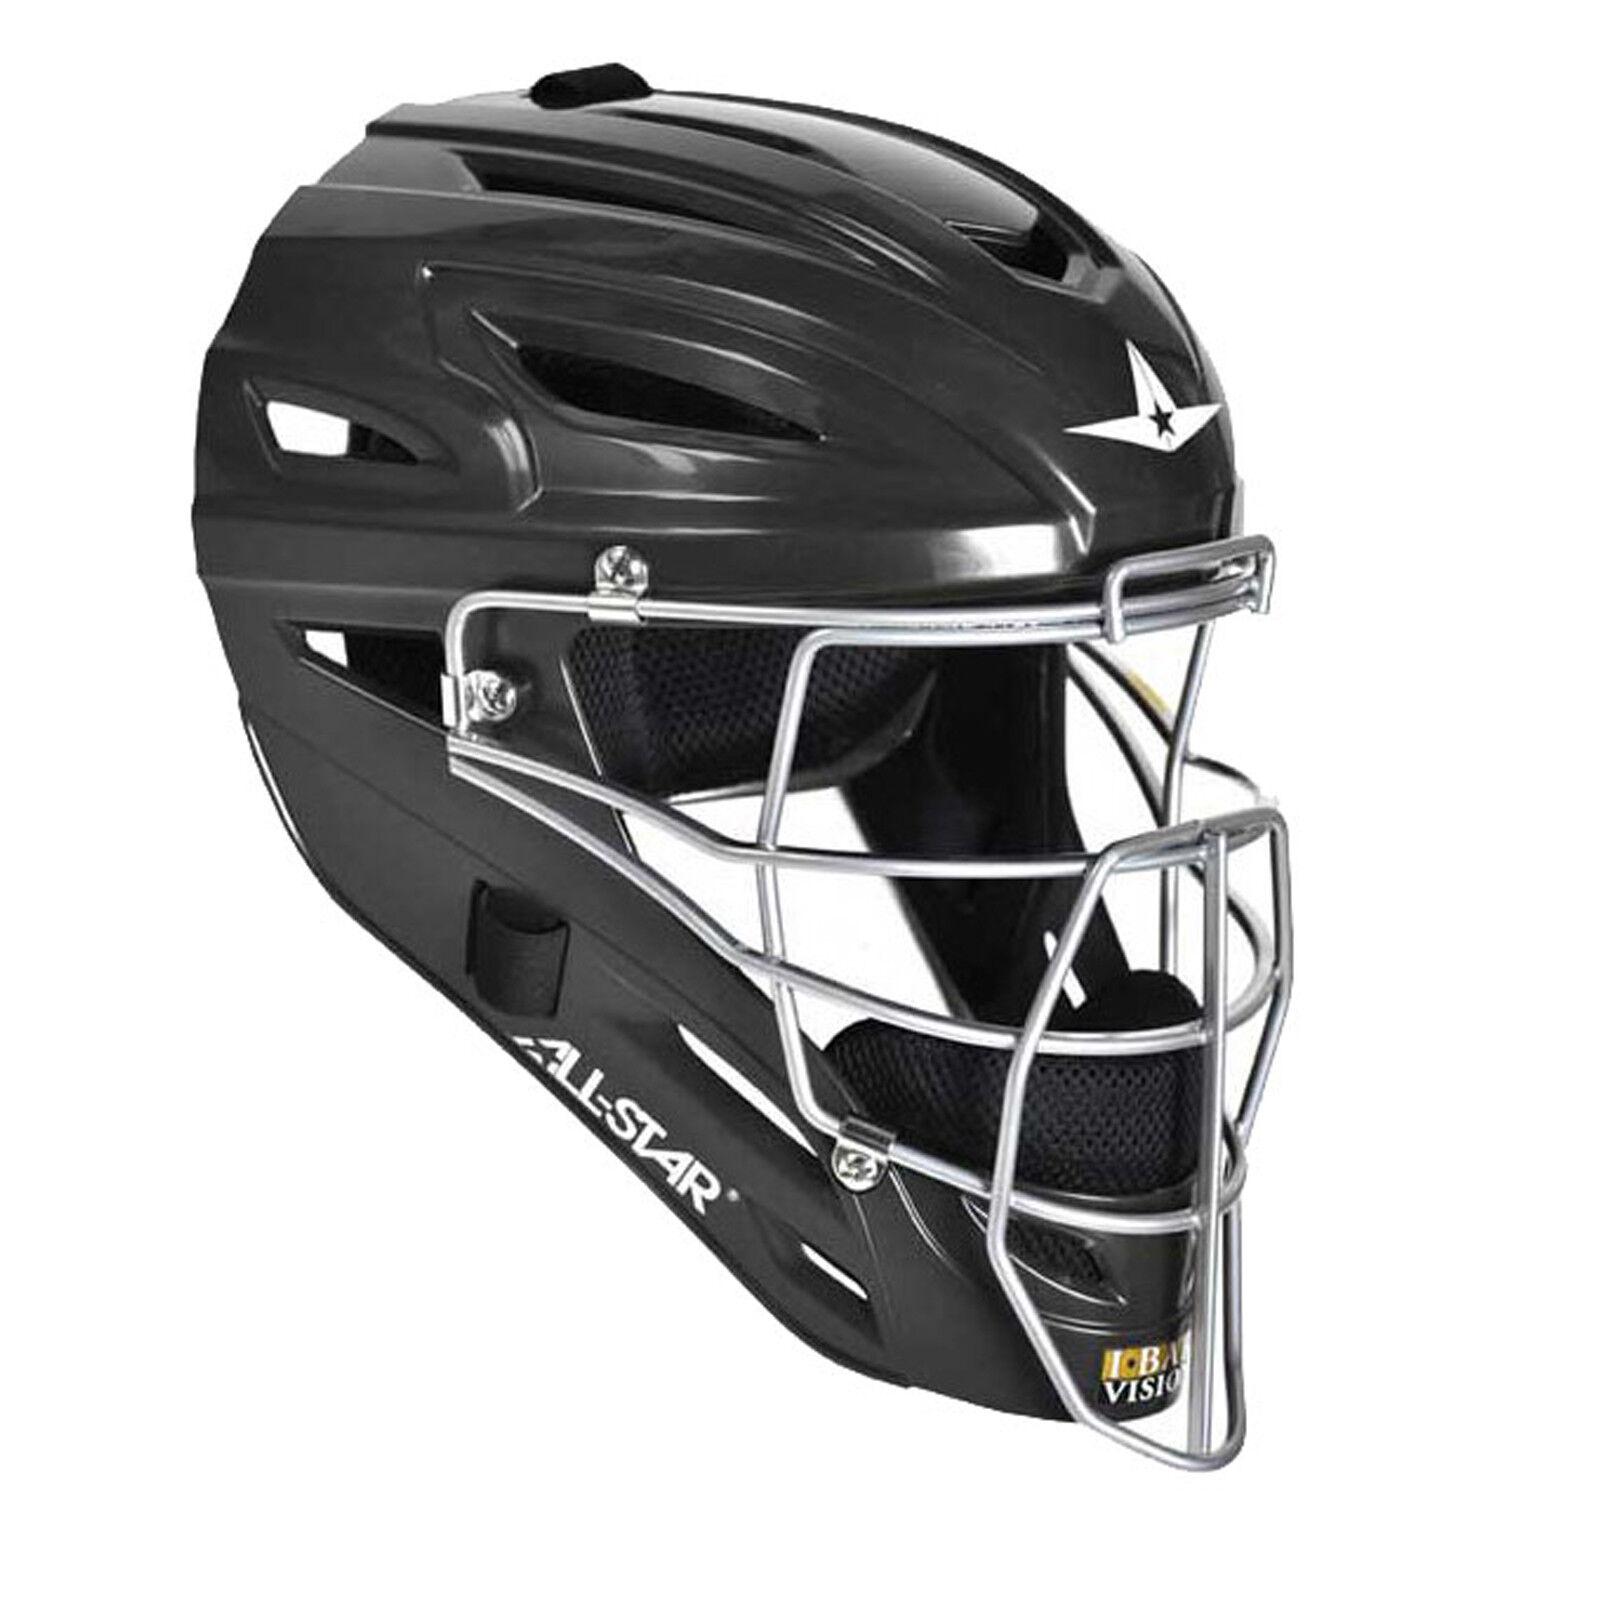 AllStar Ultracool MVP Adult Baseball Catchers Helmet (NEW) Lists @